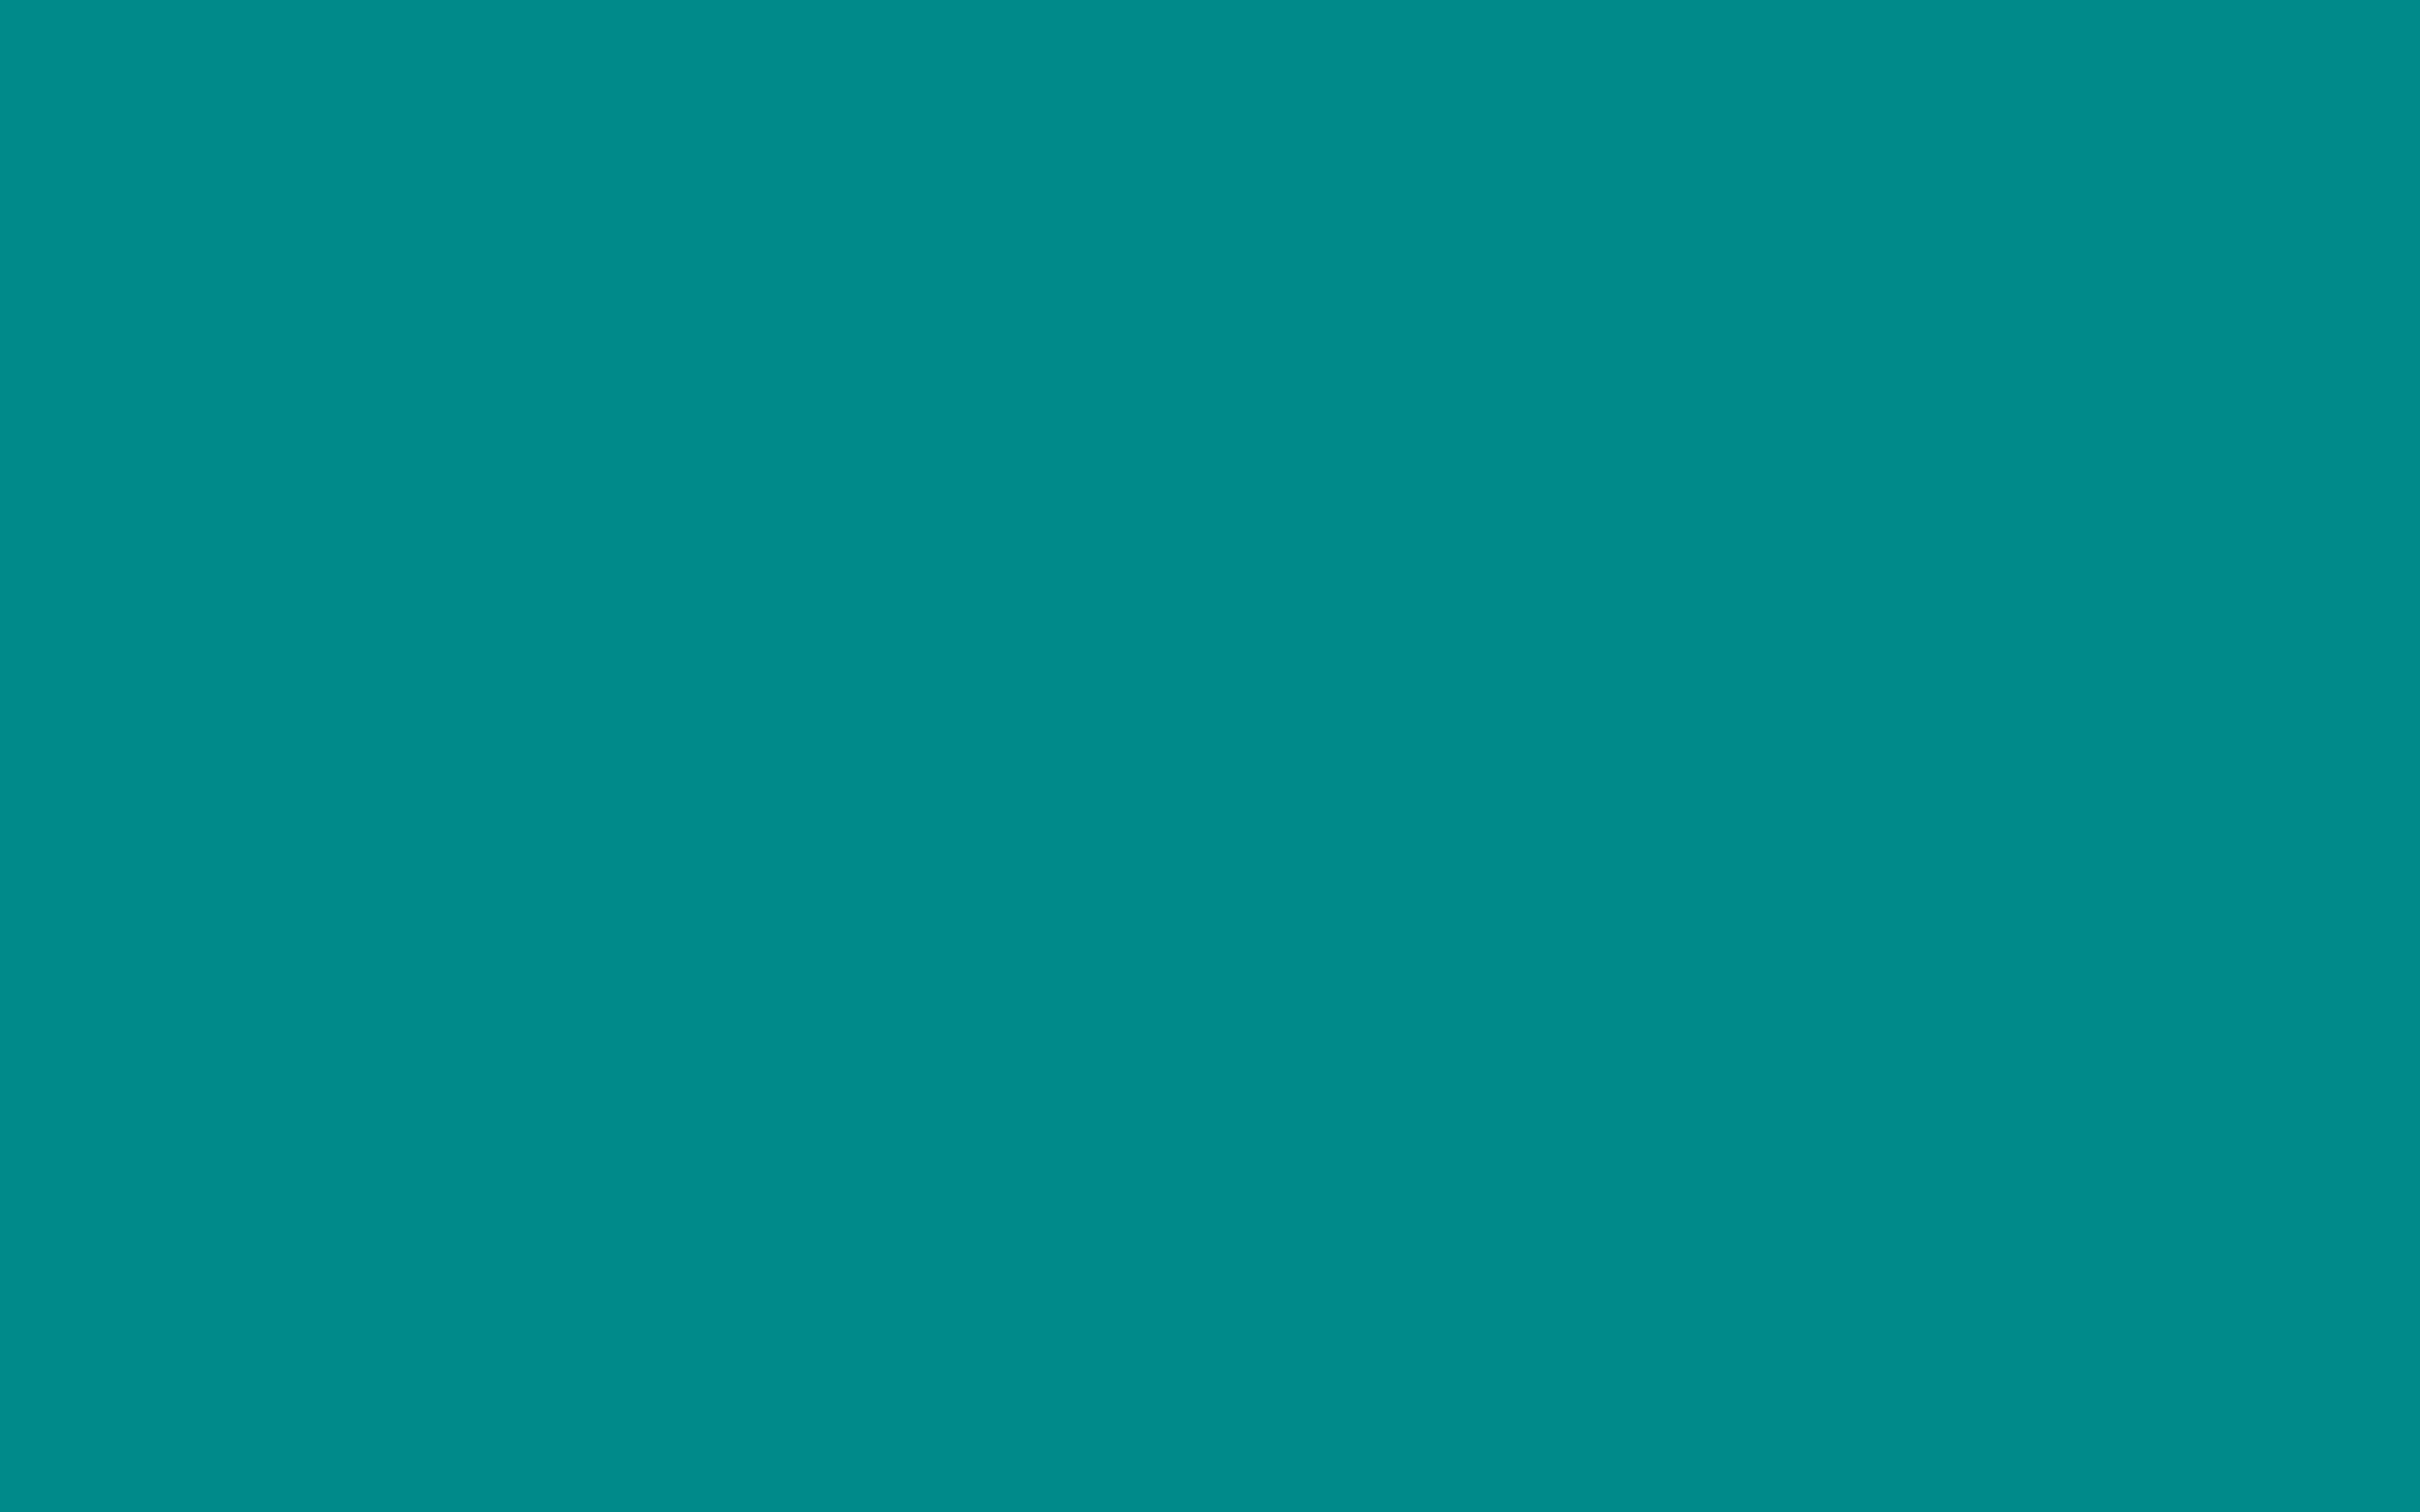 2560x1600 Dark Cyan Solid Color Background